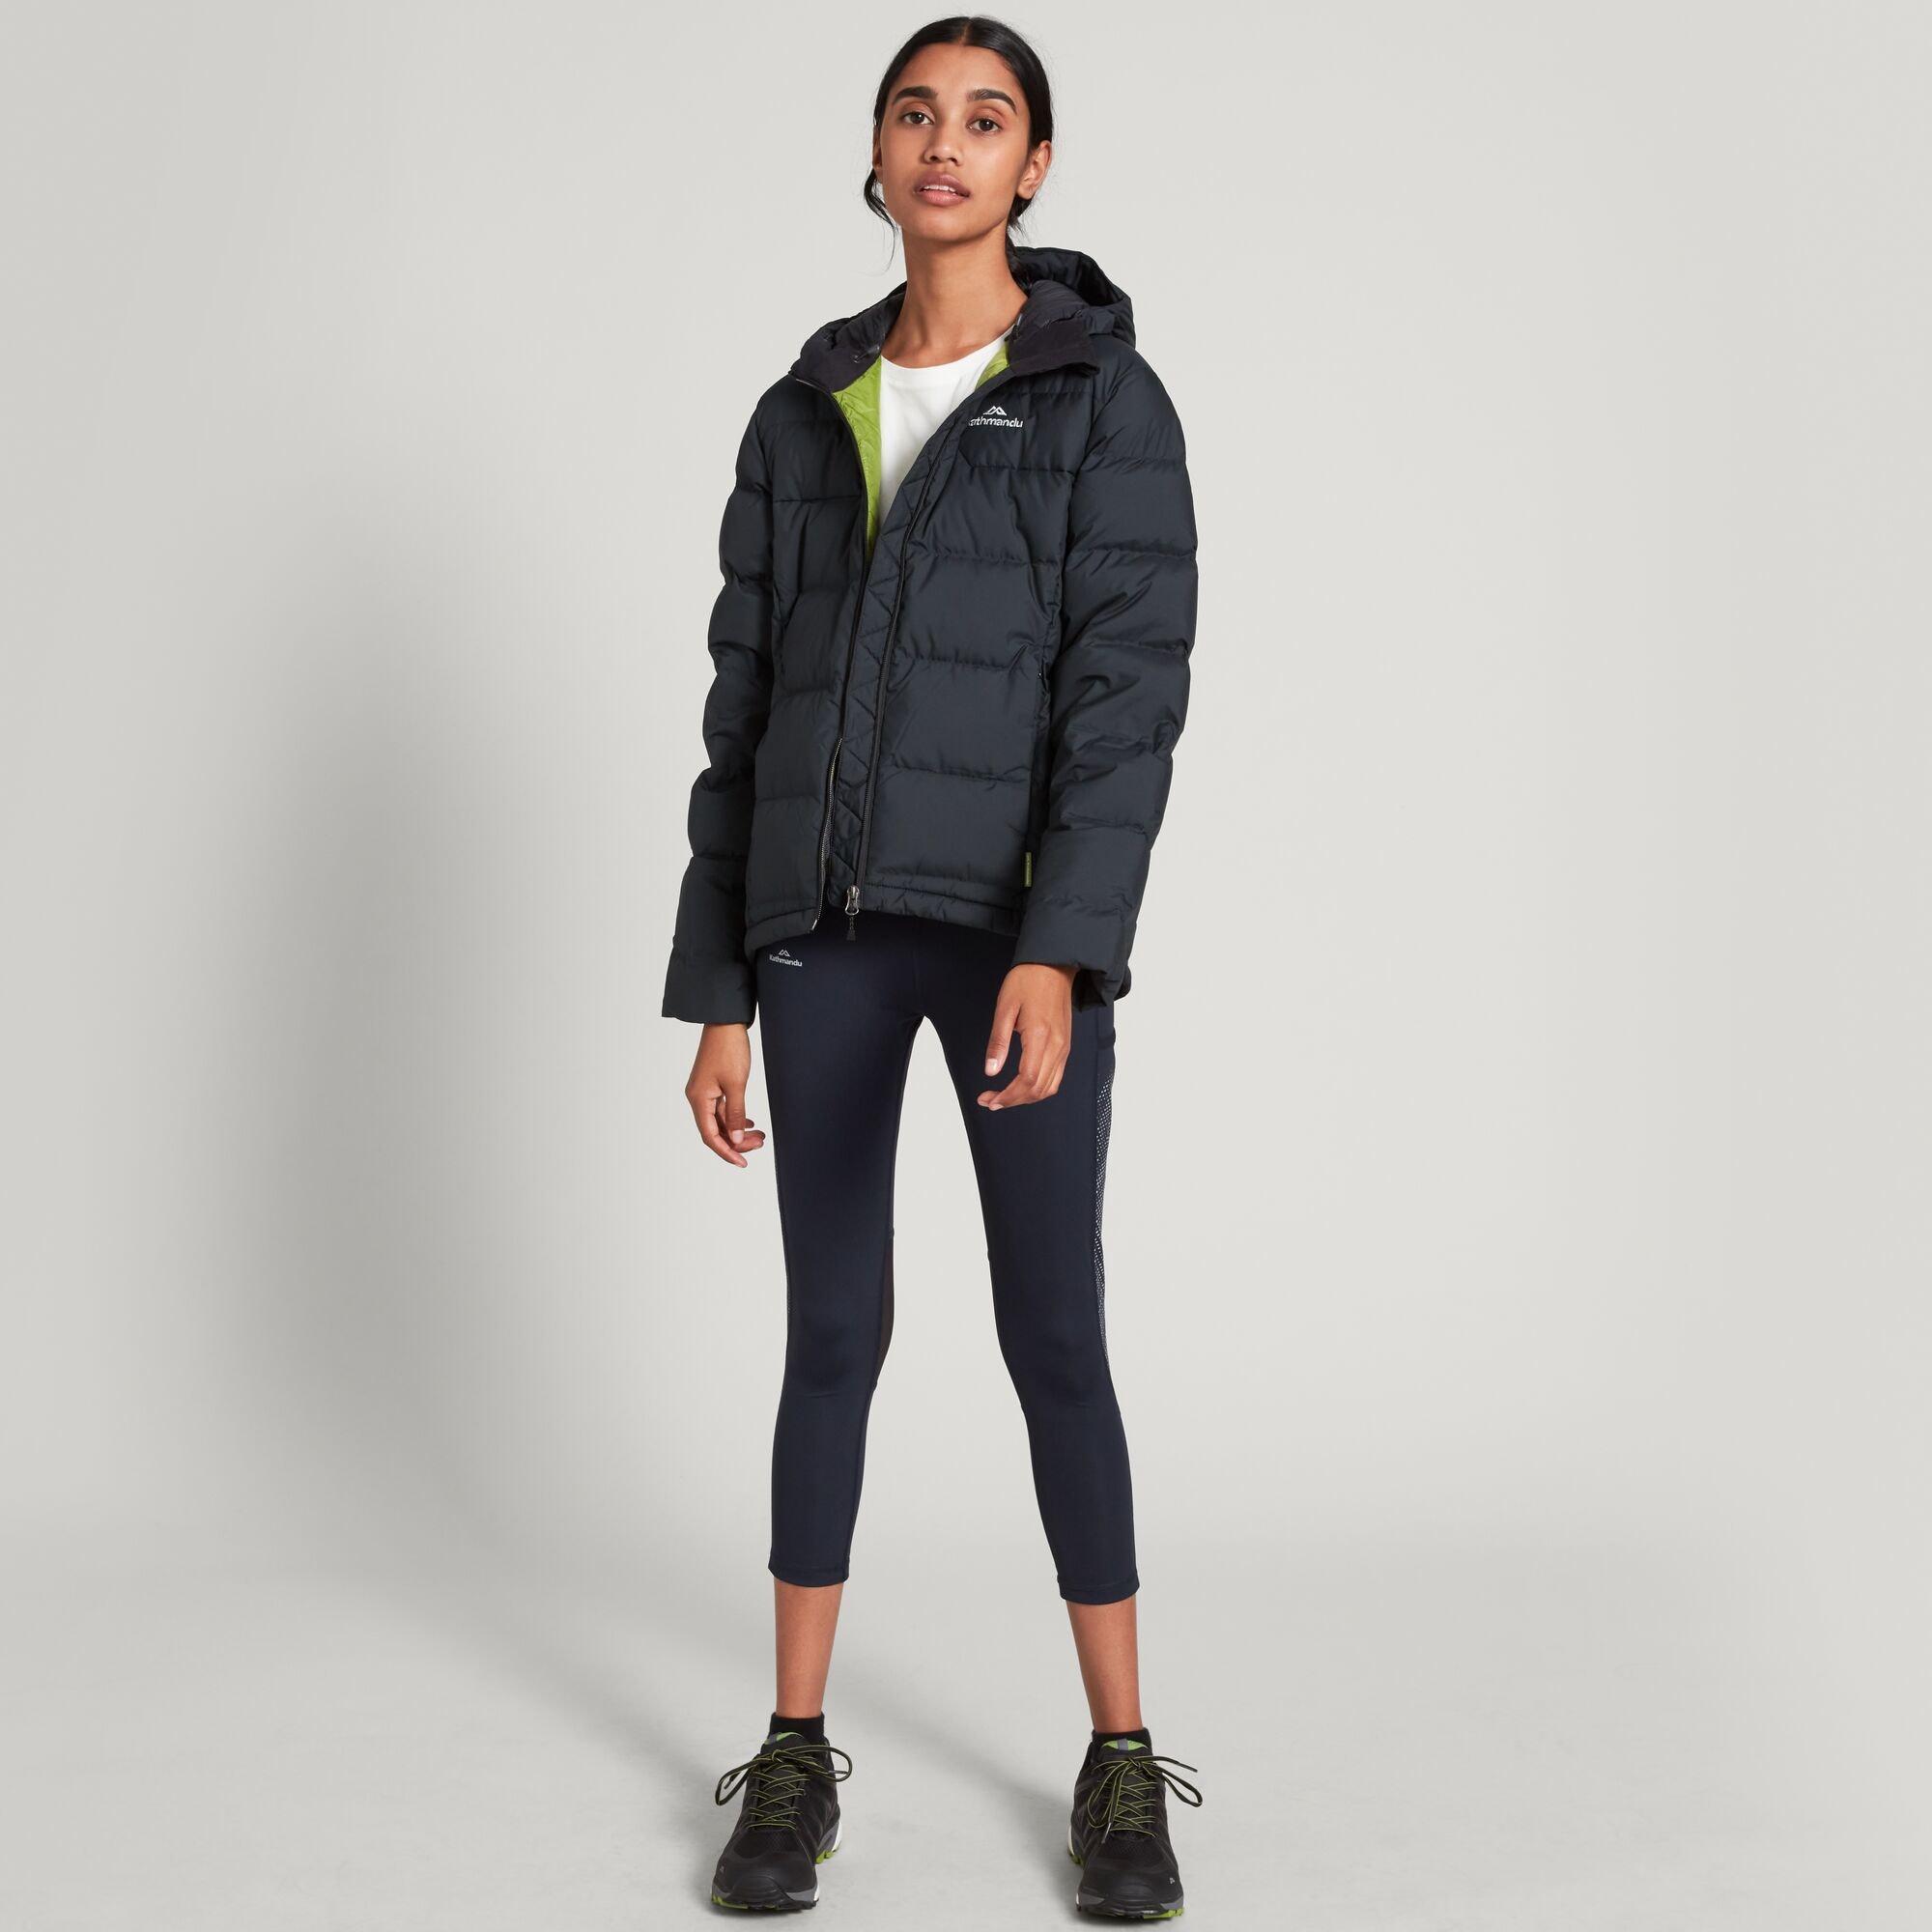 thumbnail 9 - NEW Kathmandu Epiq Womens Hooded Down Puffer 600 Fill Warm Outdoor Winter Jacket